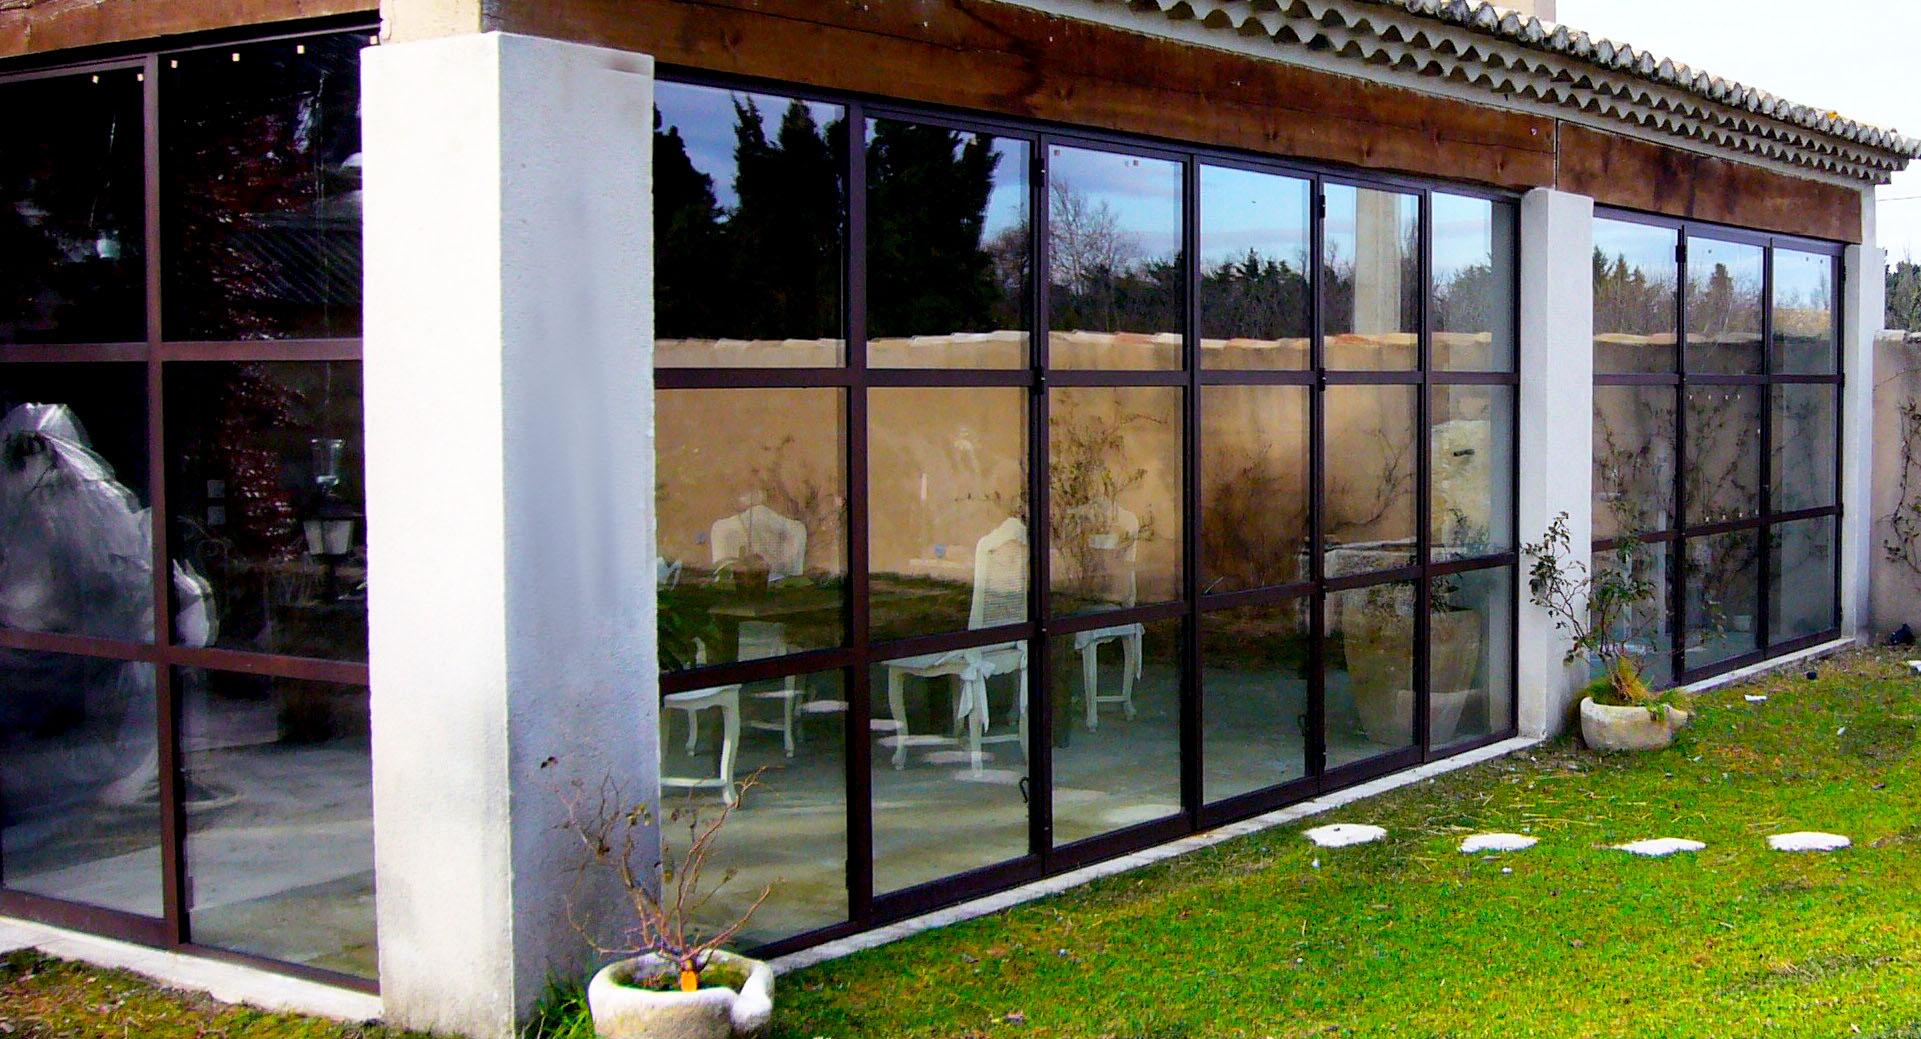 veranda acier et rupture de pont thermique vente v randas acier aix en provence. Black Bedroom Furniture Sets. Home Design Ideas